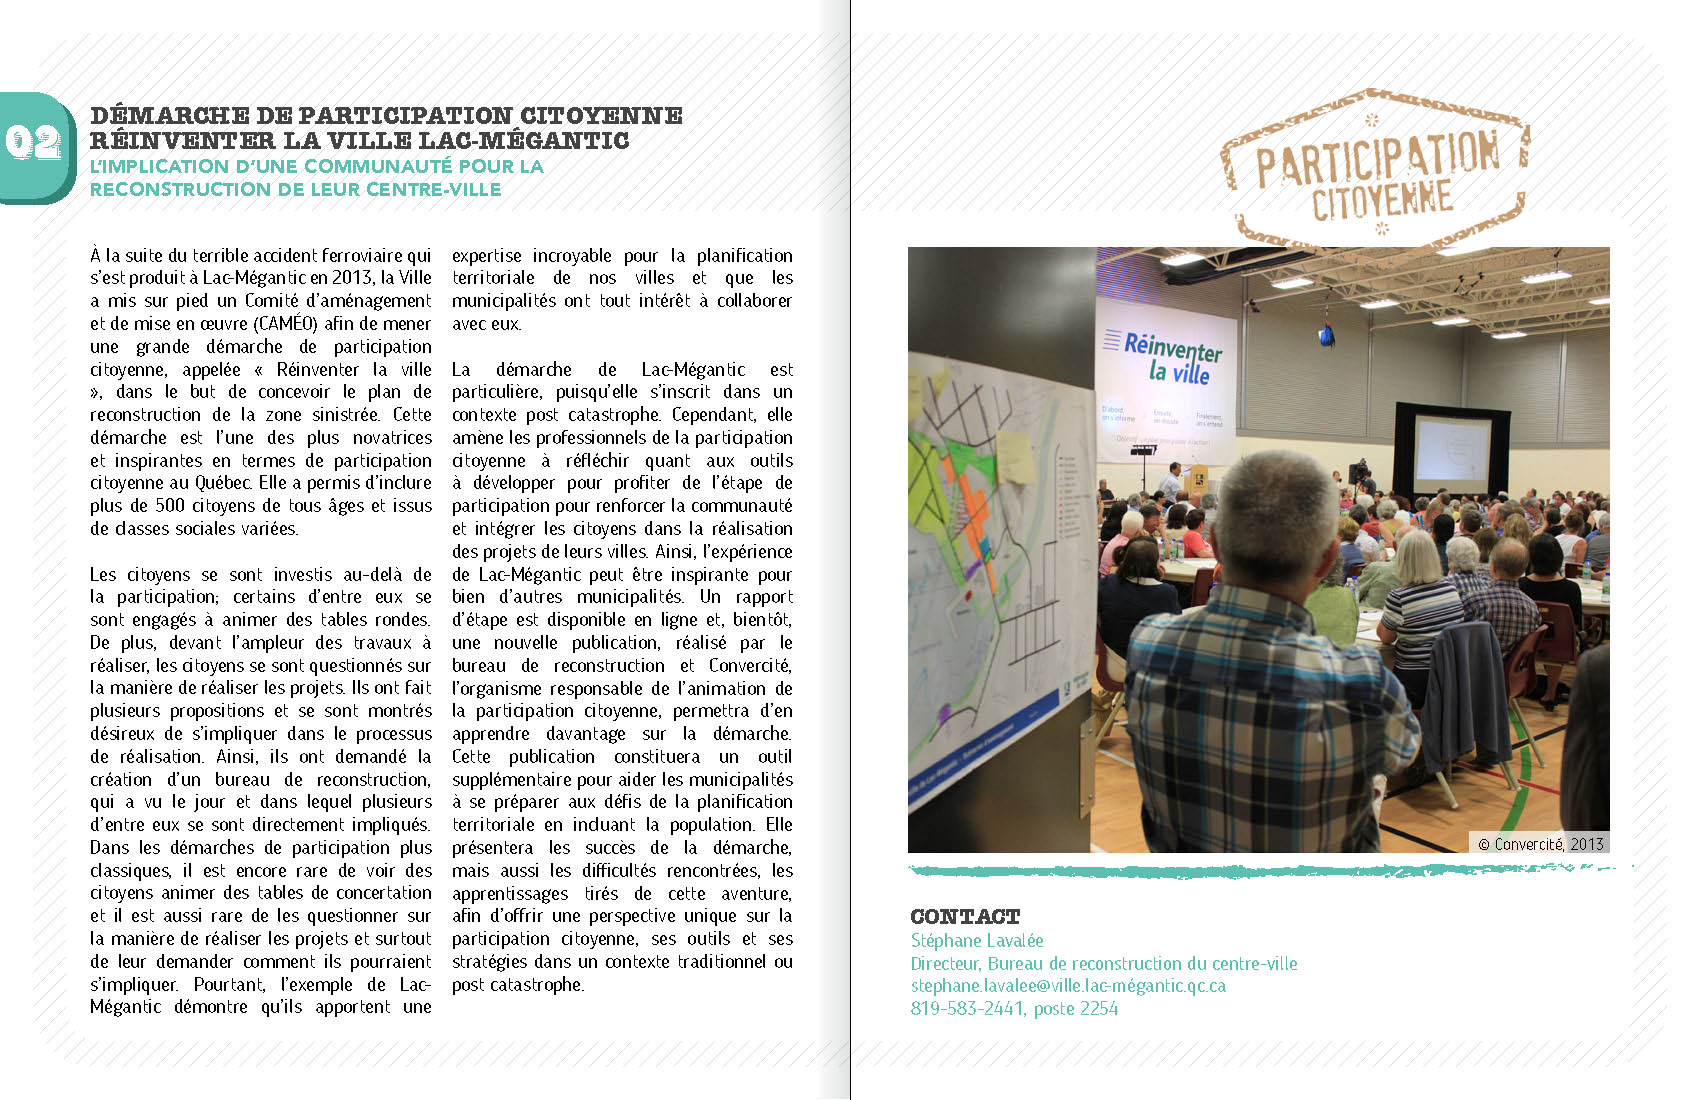 pr15-12_RRU_passeport_FINALv2_Page_05.jpg